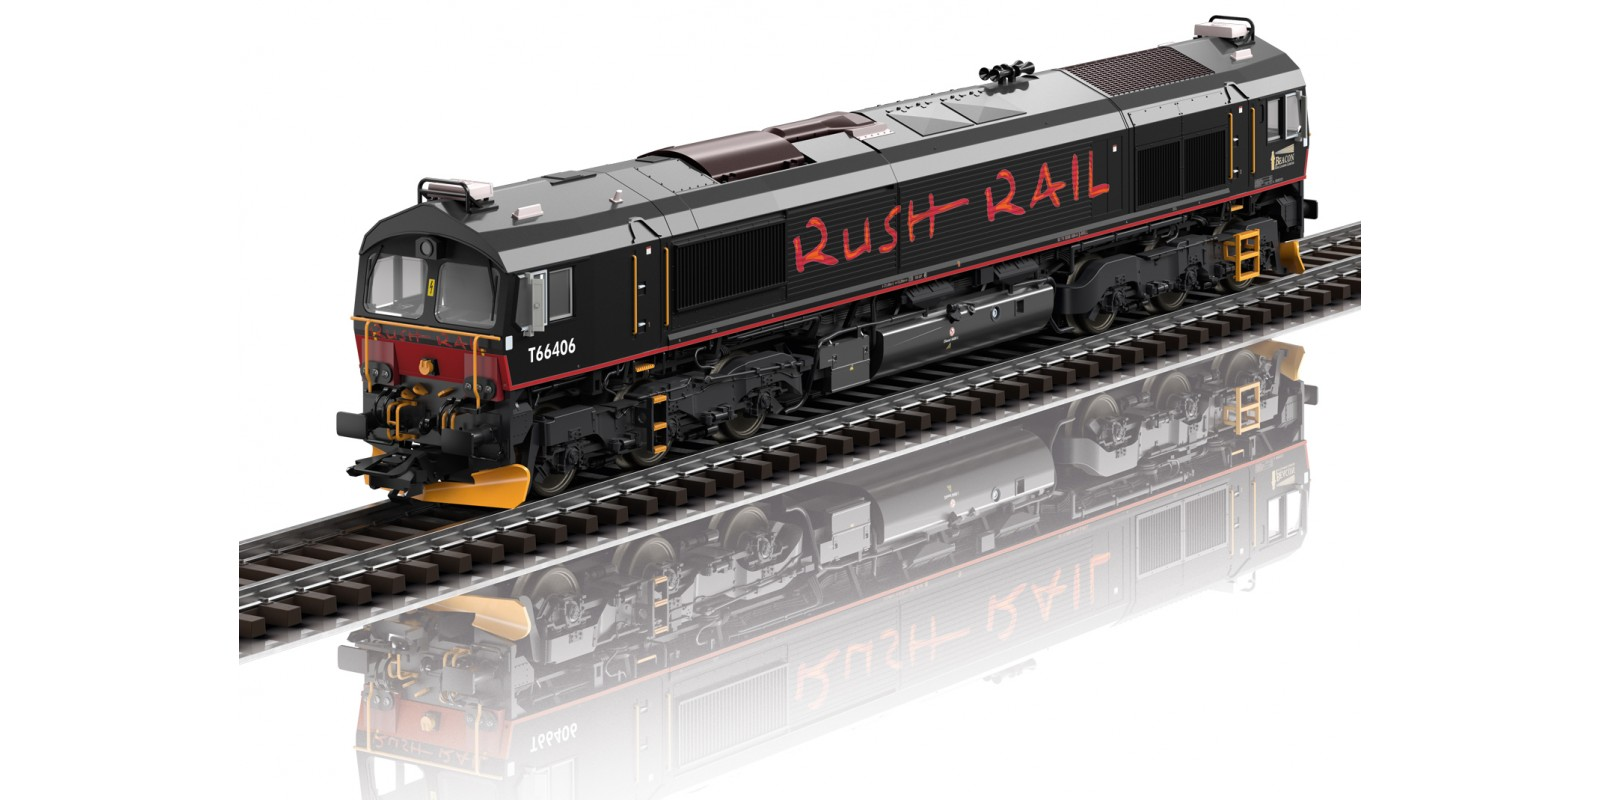 T22997 Class 66 Diesel Locomotive